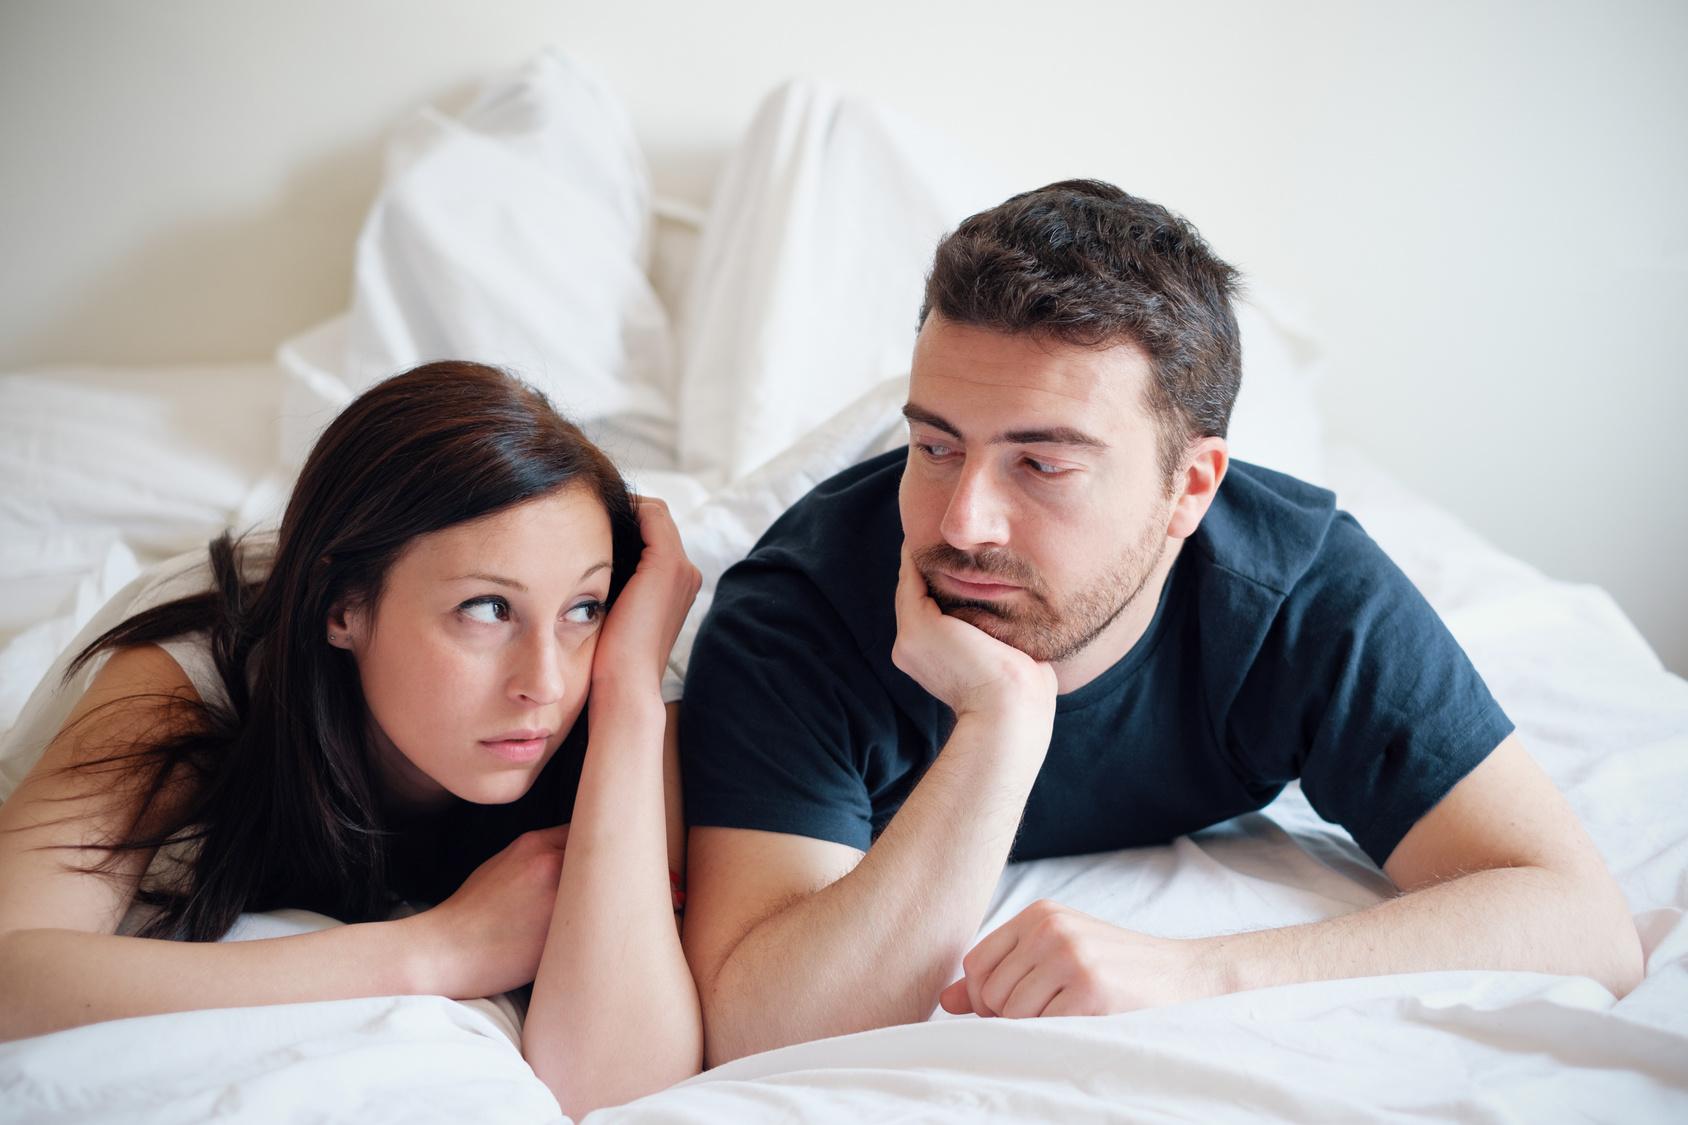 Dating-Beziehung definiert Erste Basis-Dating-Begriffe